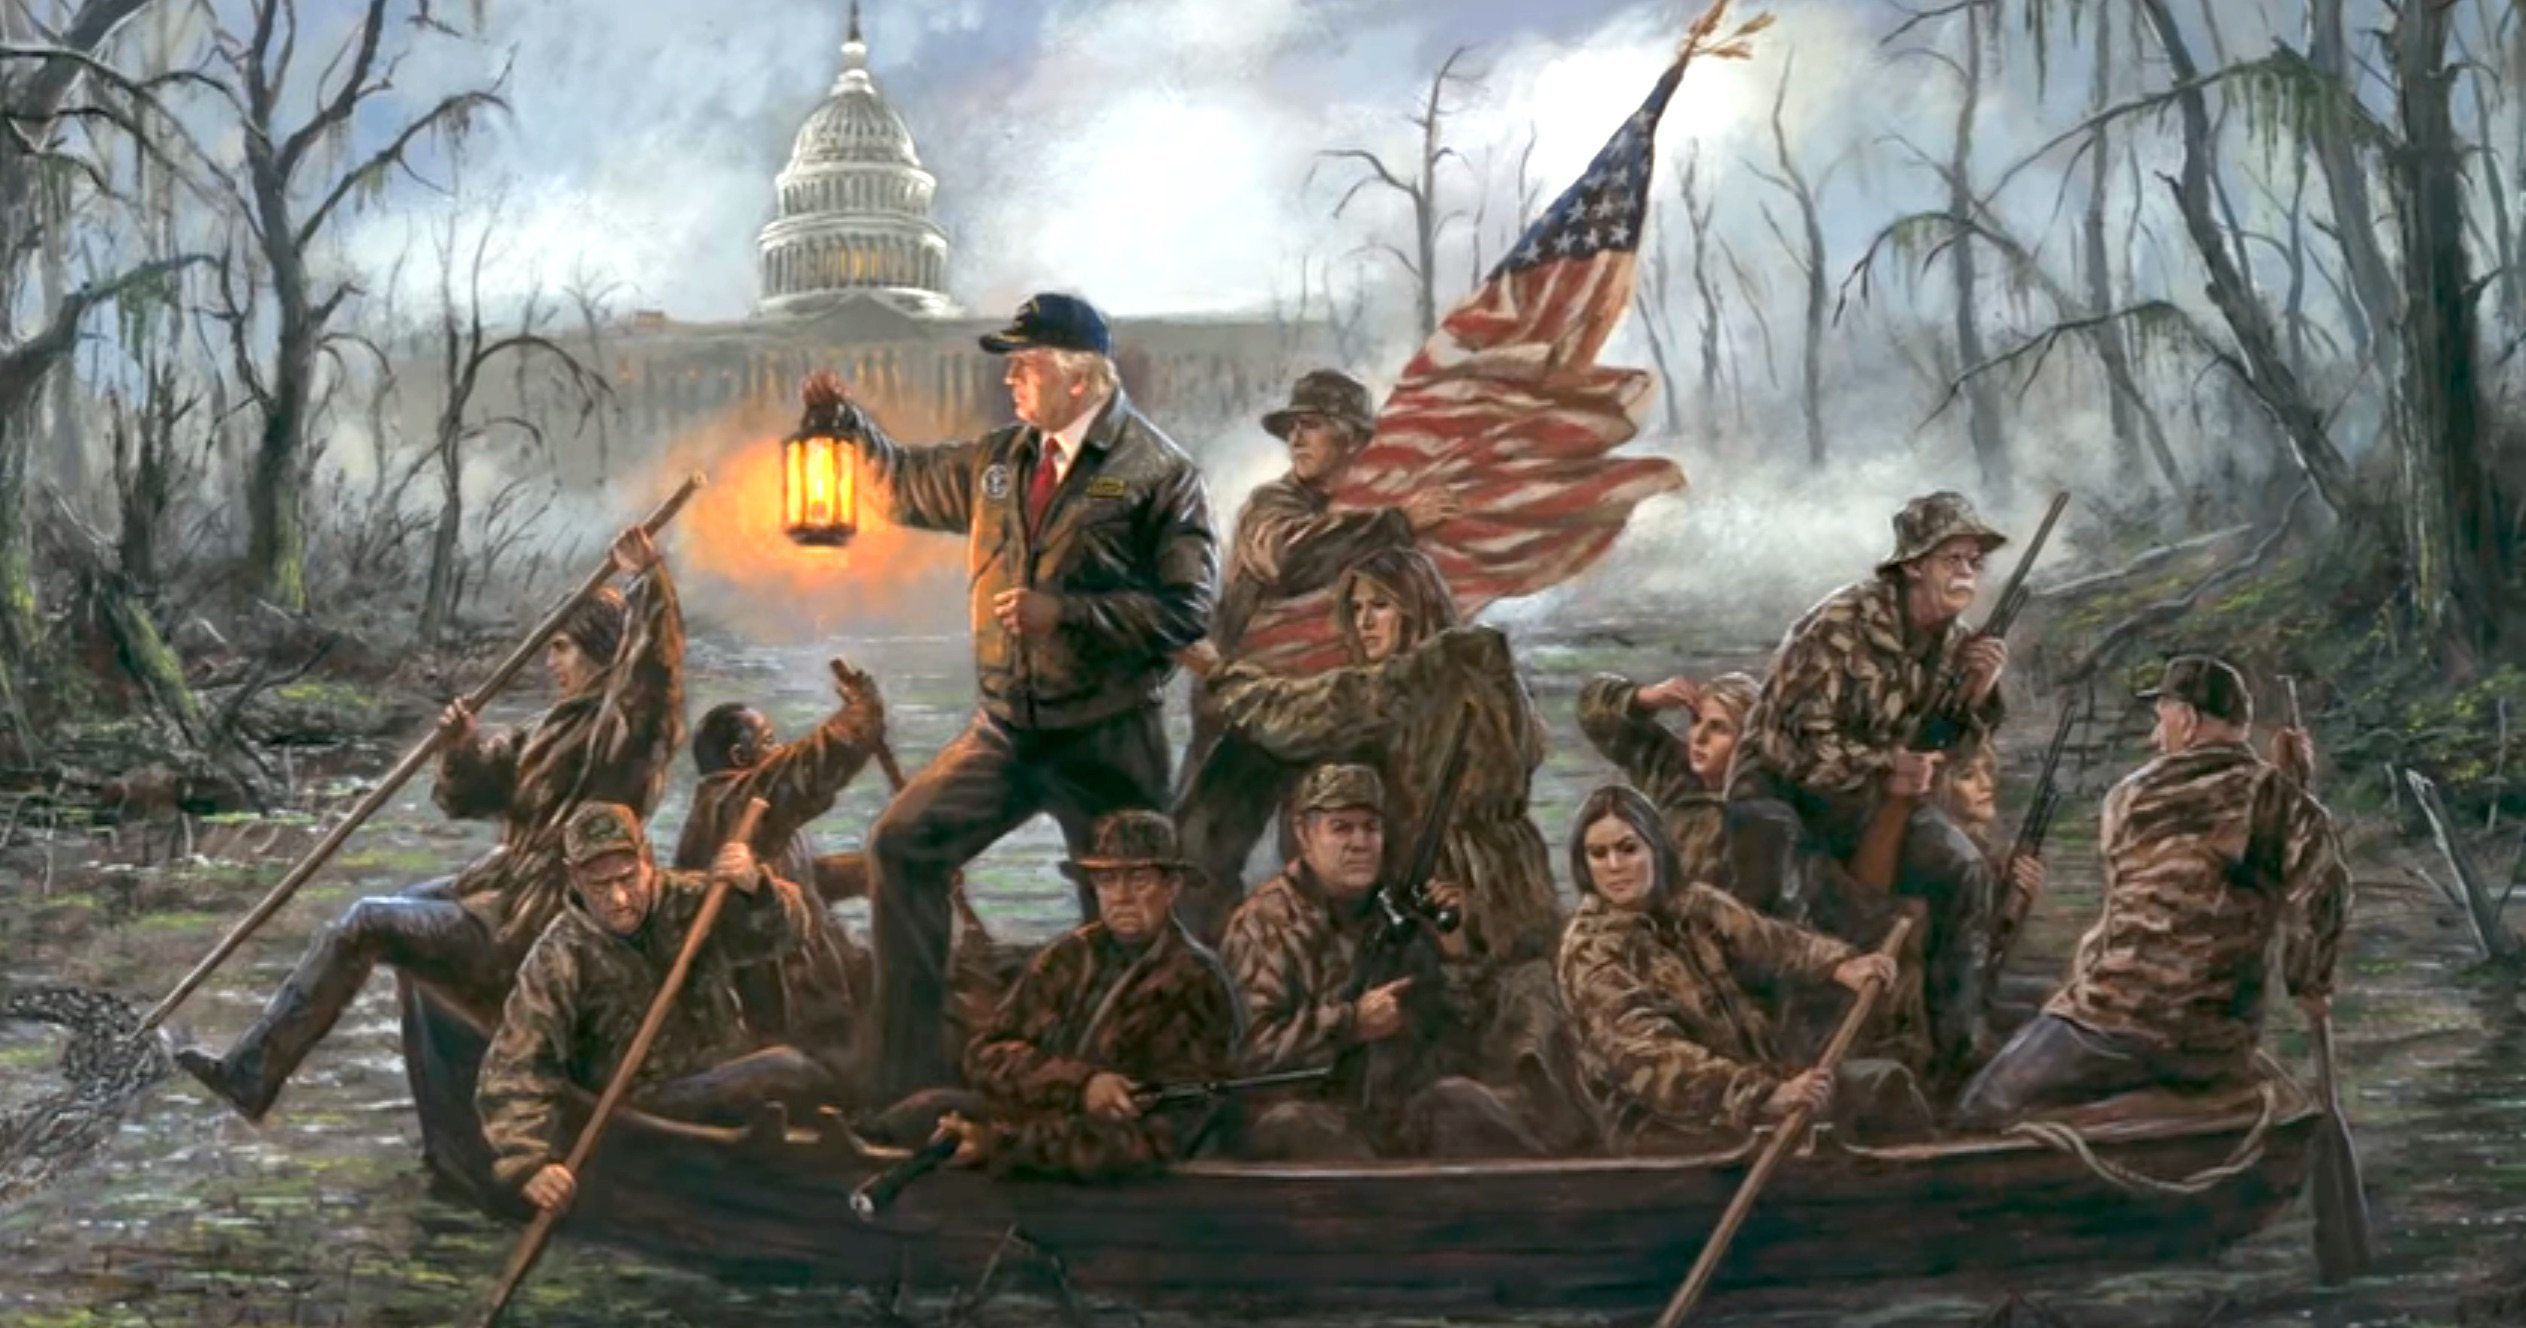 Trump Crossing the Swamp